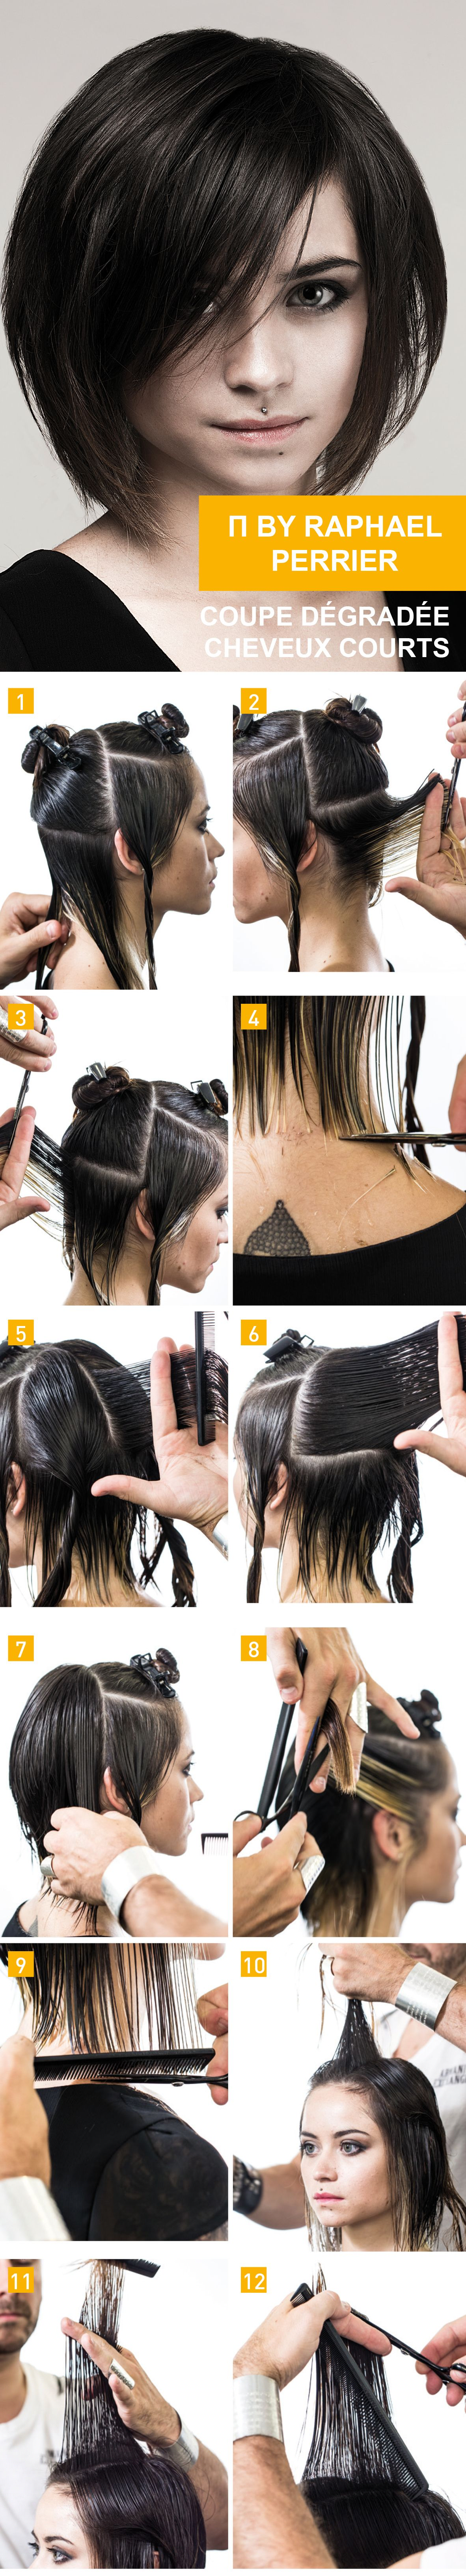 40+ Raphael coiffure inspiration